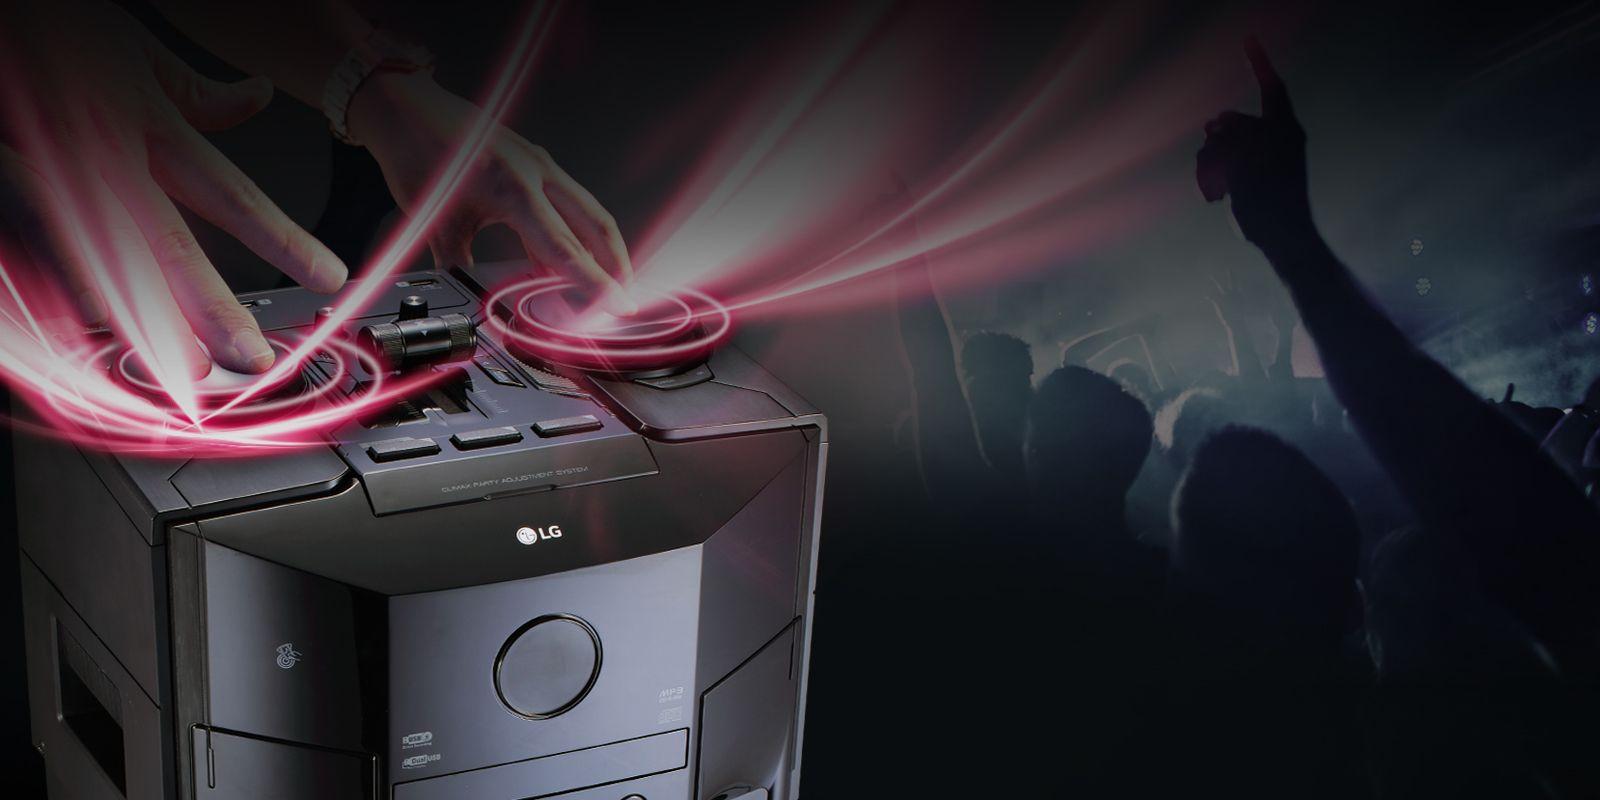 Sistem audio LG OM5560